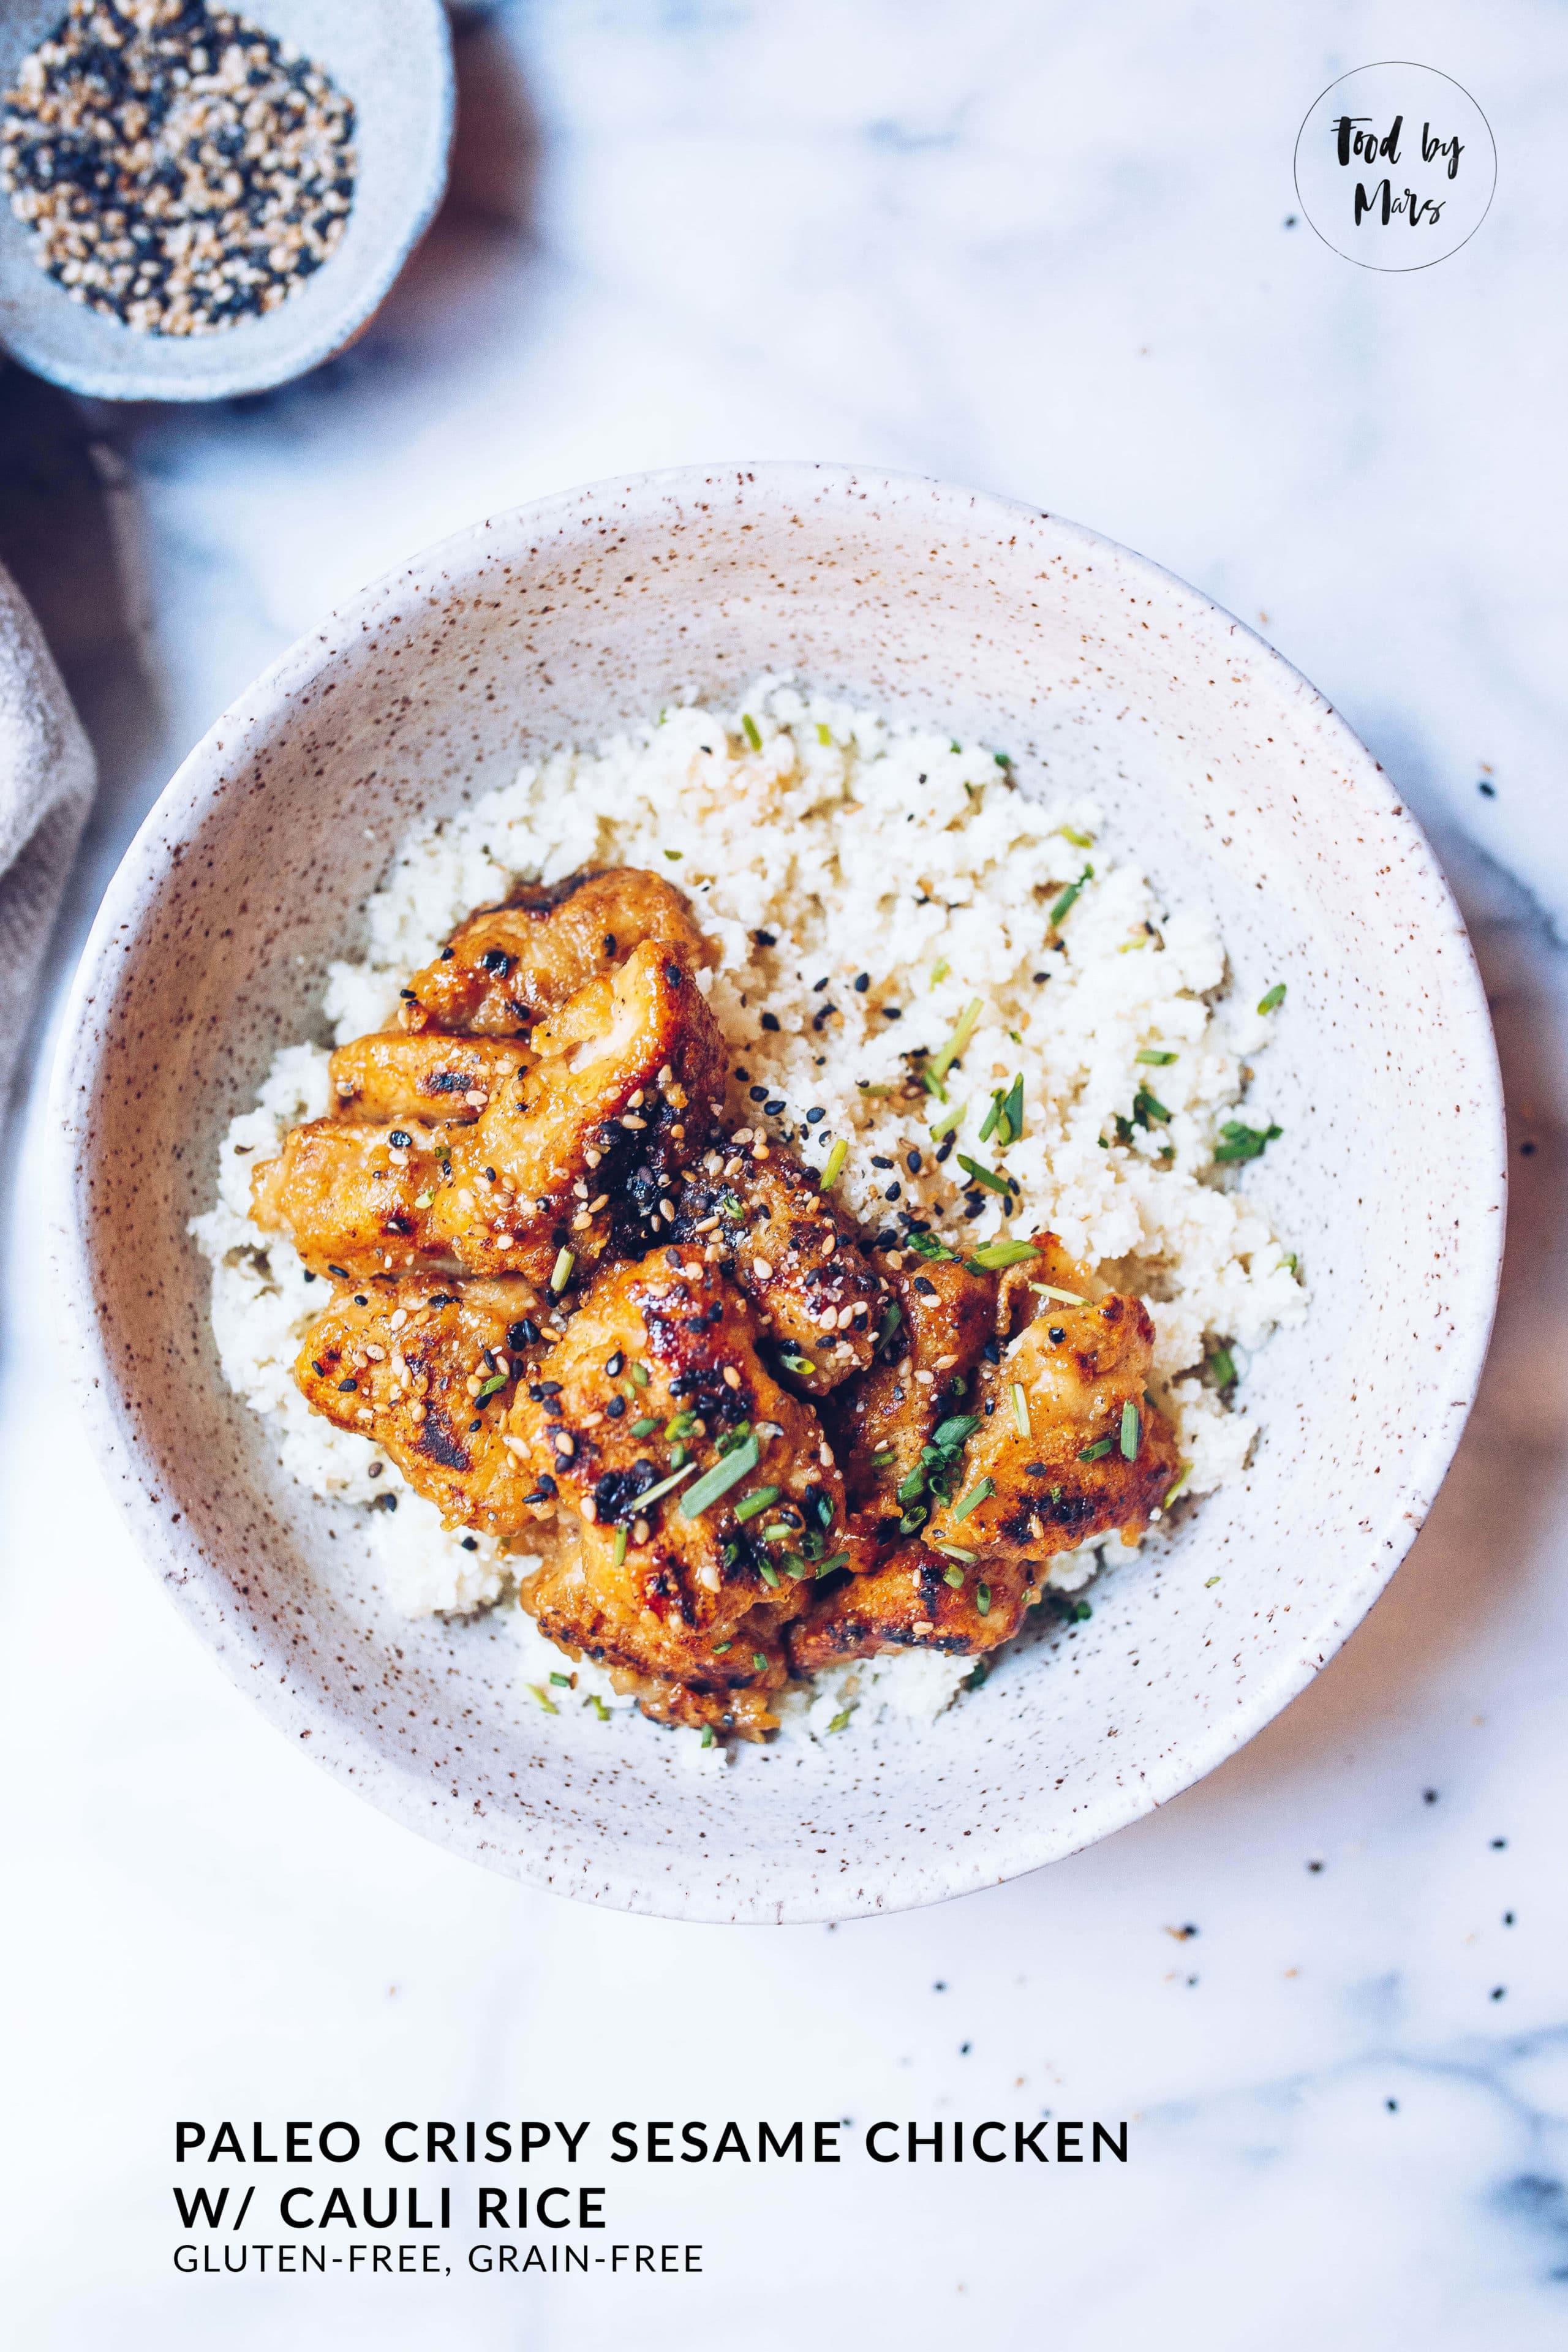 Paleo Crispy Sesame Chicken with Cauli Rice via Food by Mars